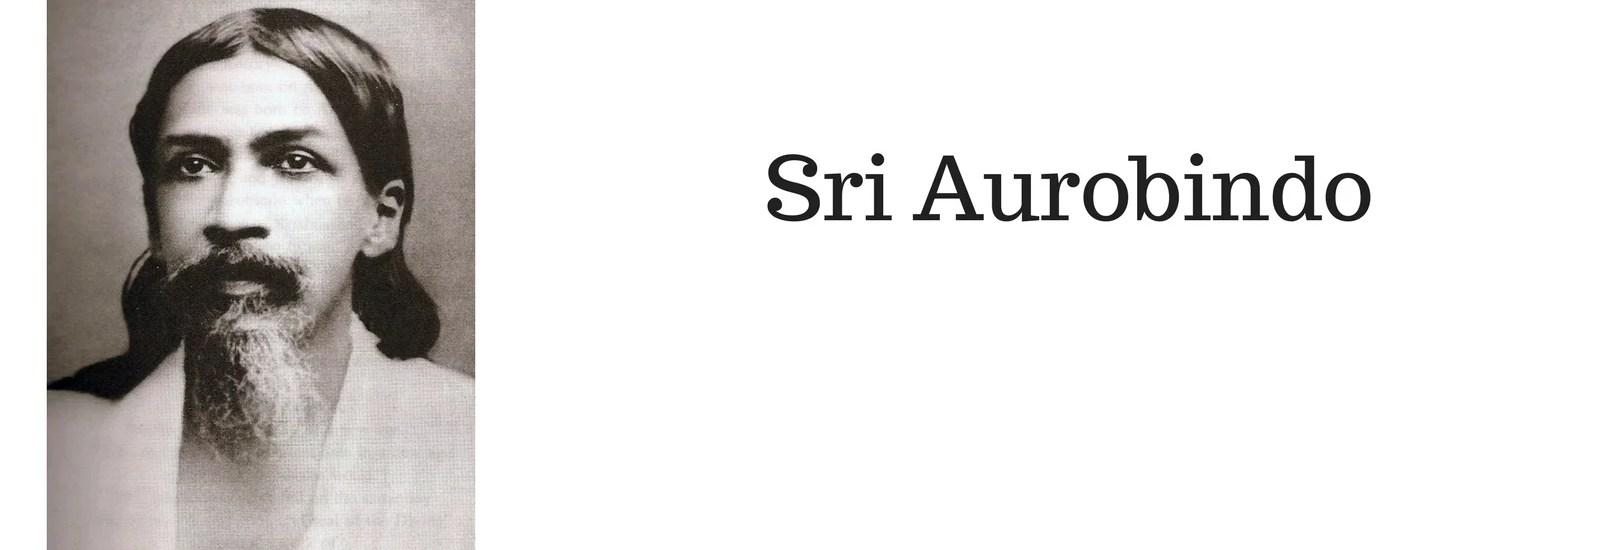 Introducing Sri Aurobindo